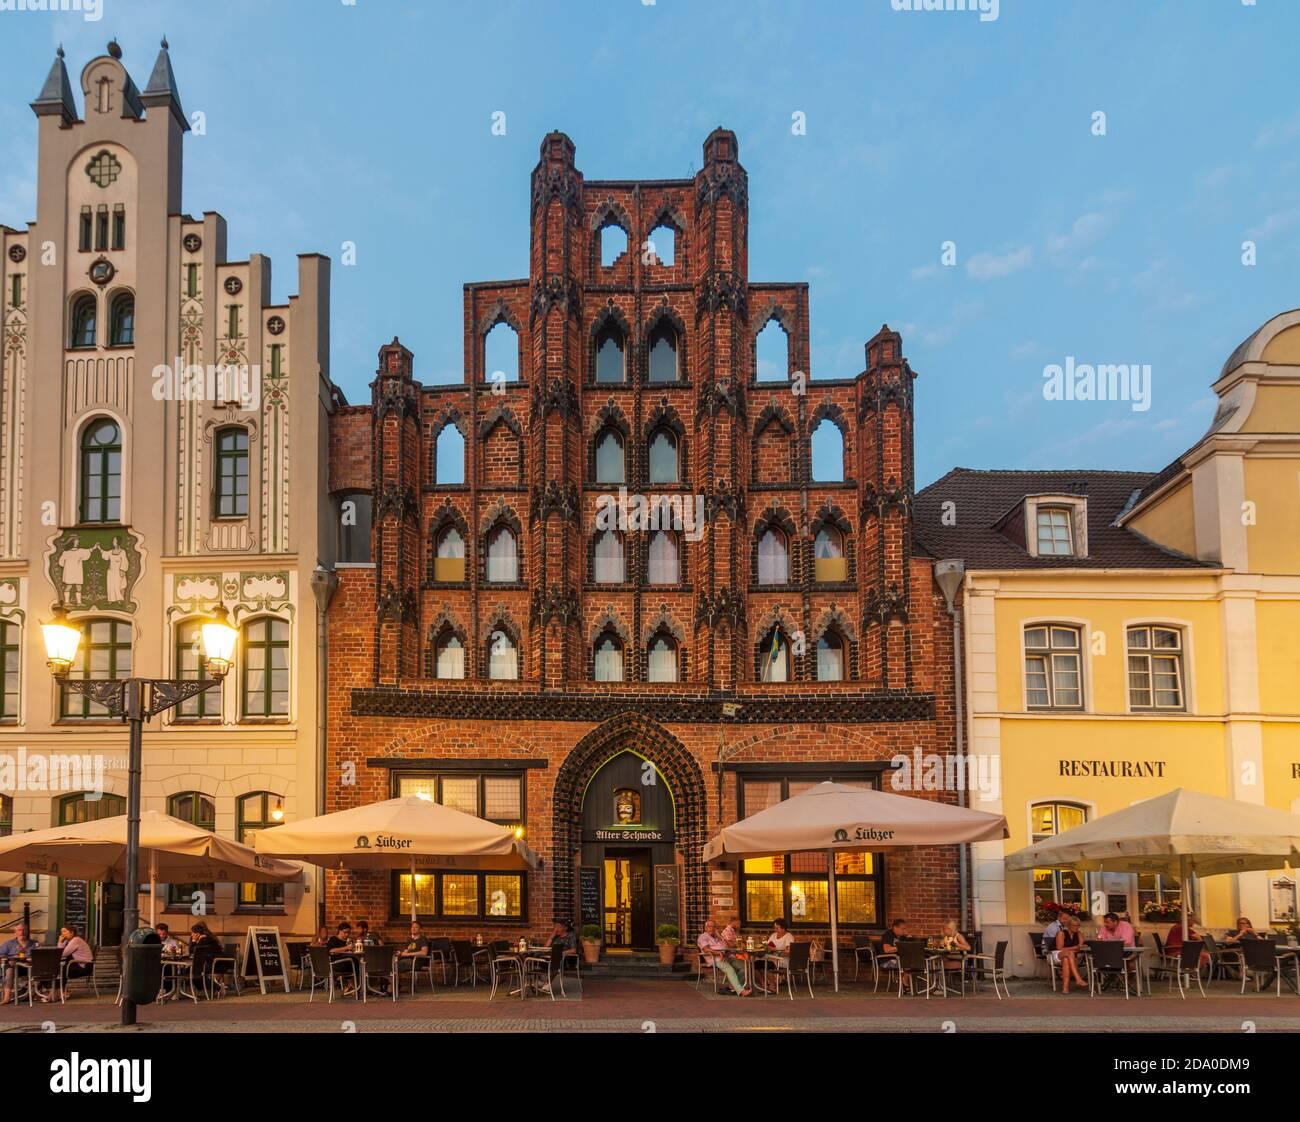 Wismar: Market Square with house Alter Schwede, Ostsee (Baltic Sea), Mecklenburg-Vorpommern, Germany Stock Photo